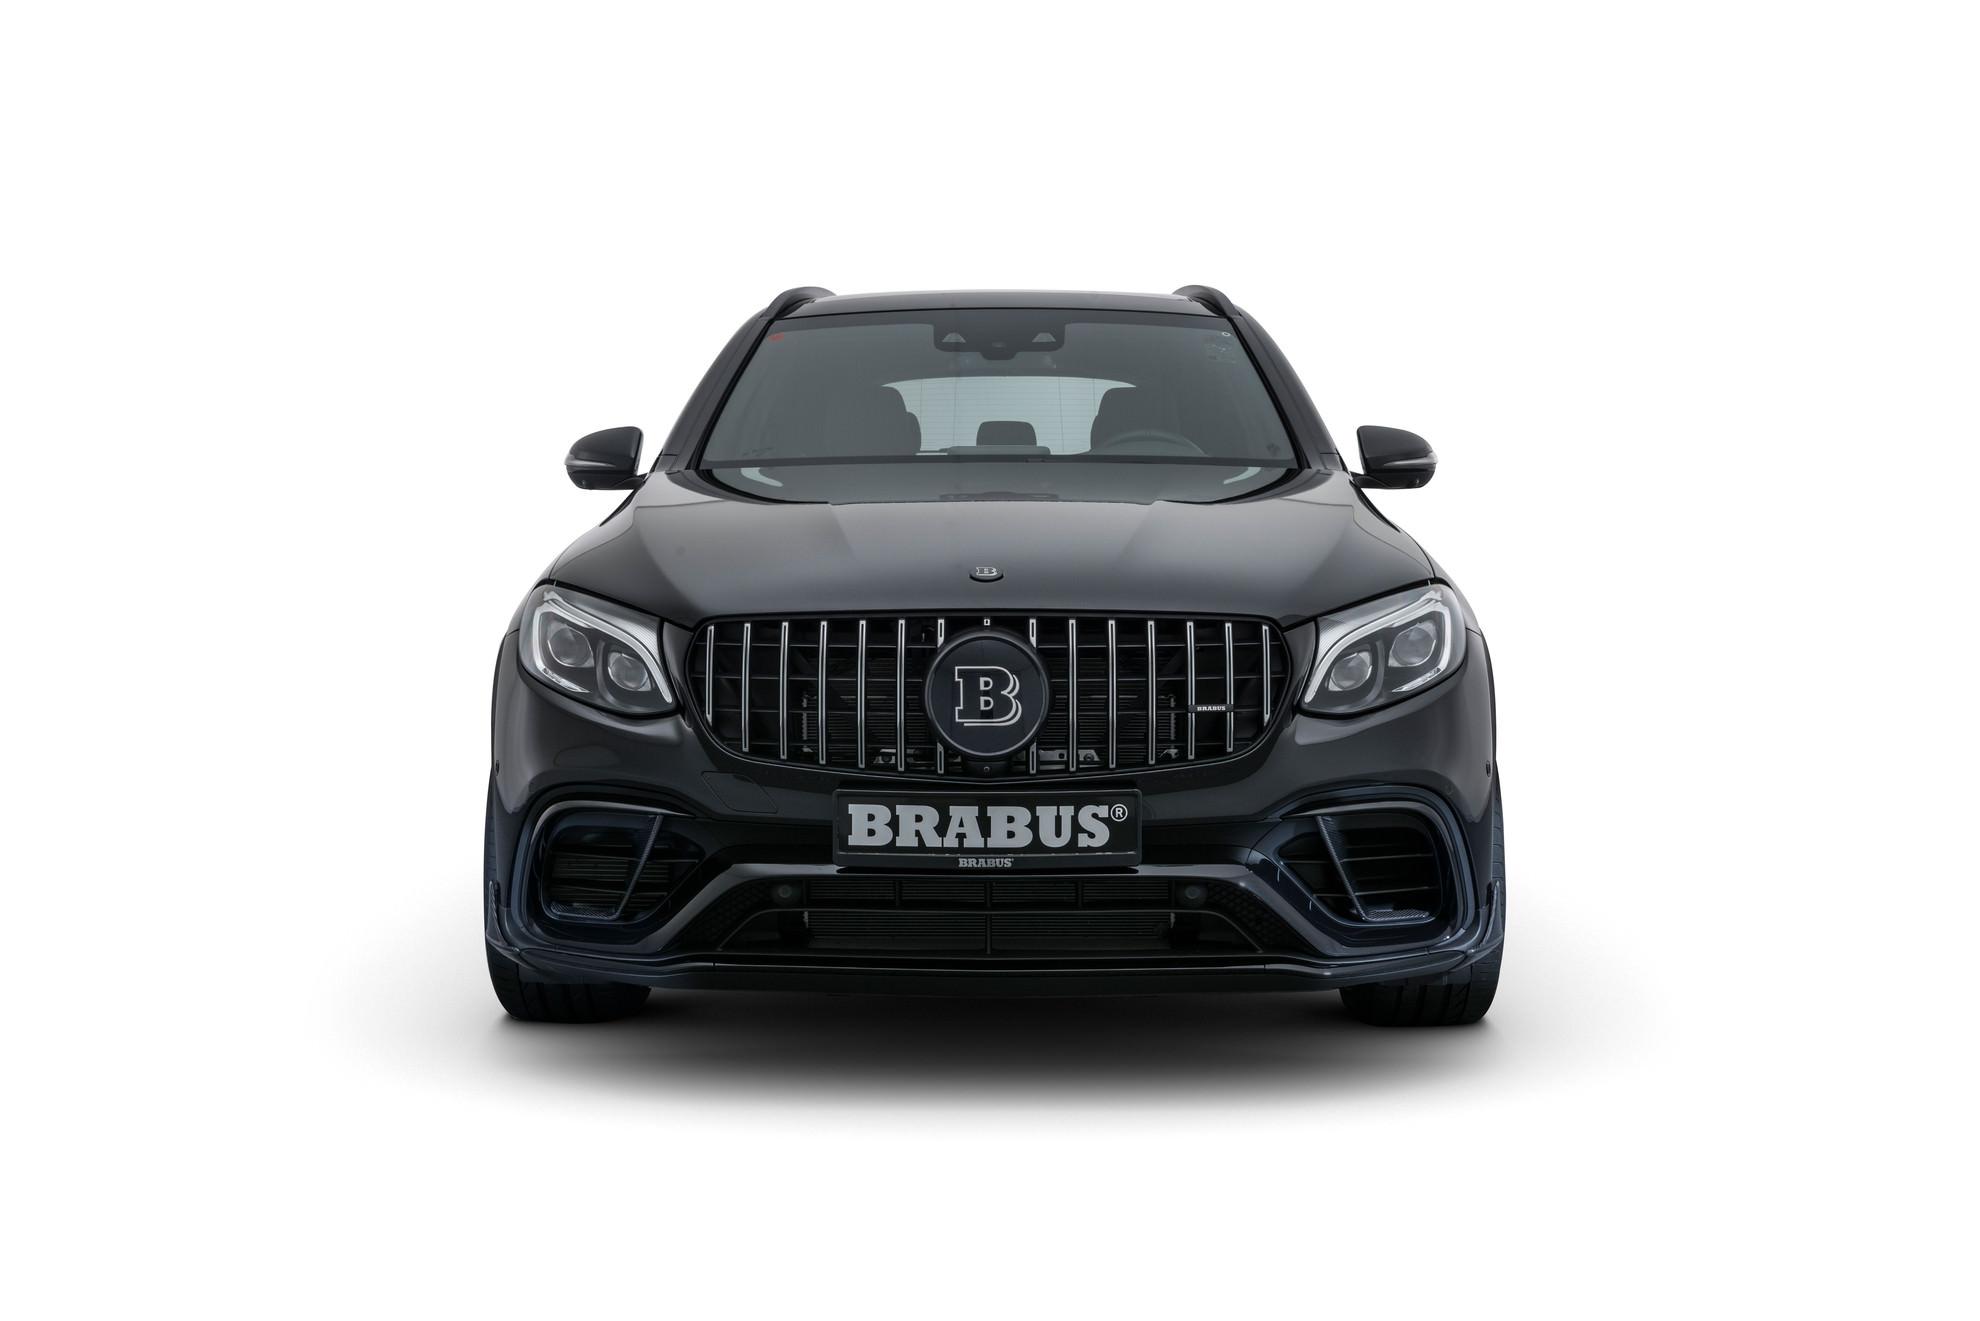 Brabus Mercedes Glc 2016 2019 Pitlane Tuning Shop